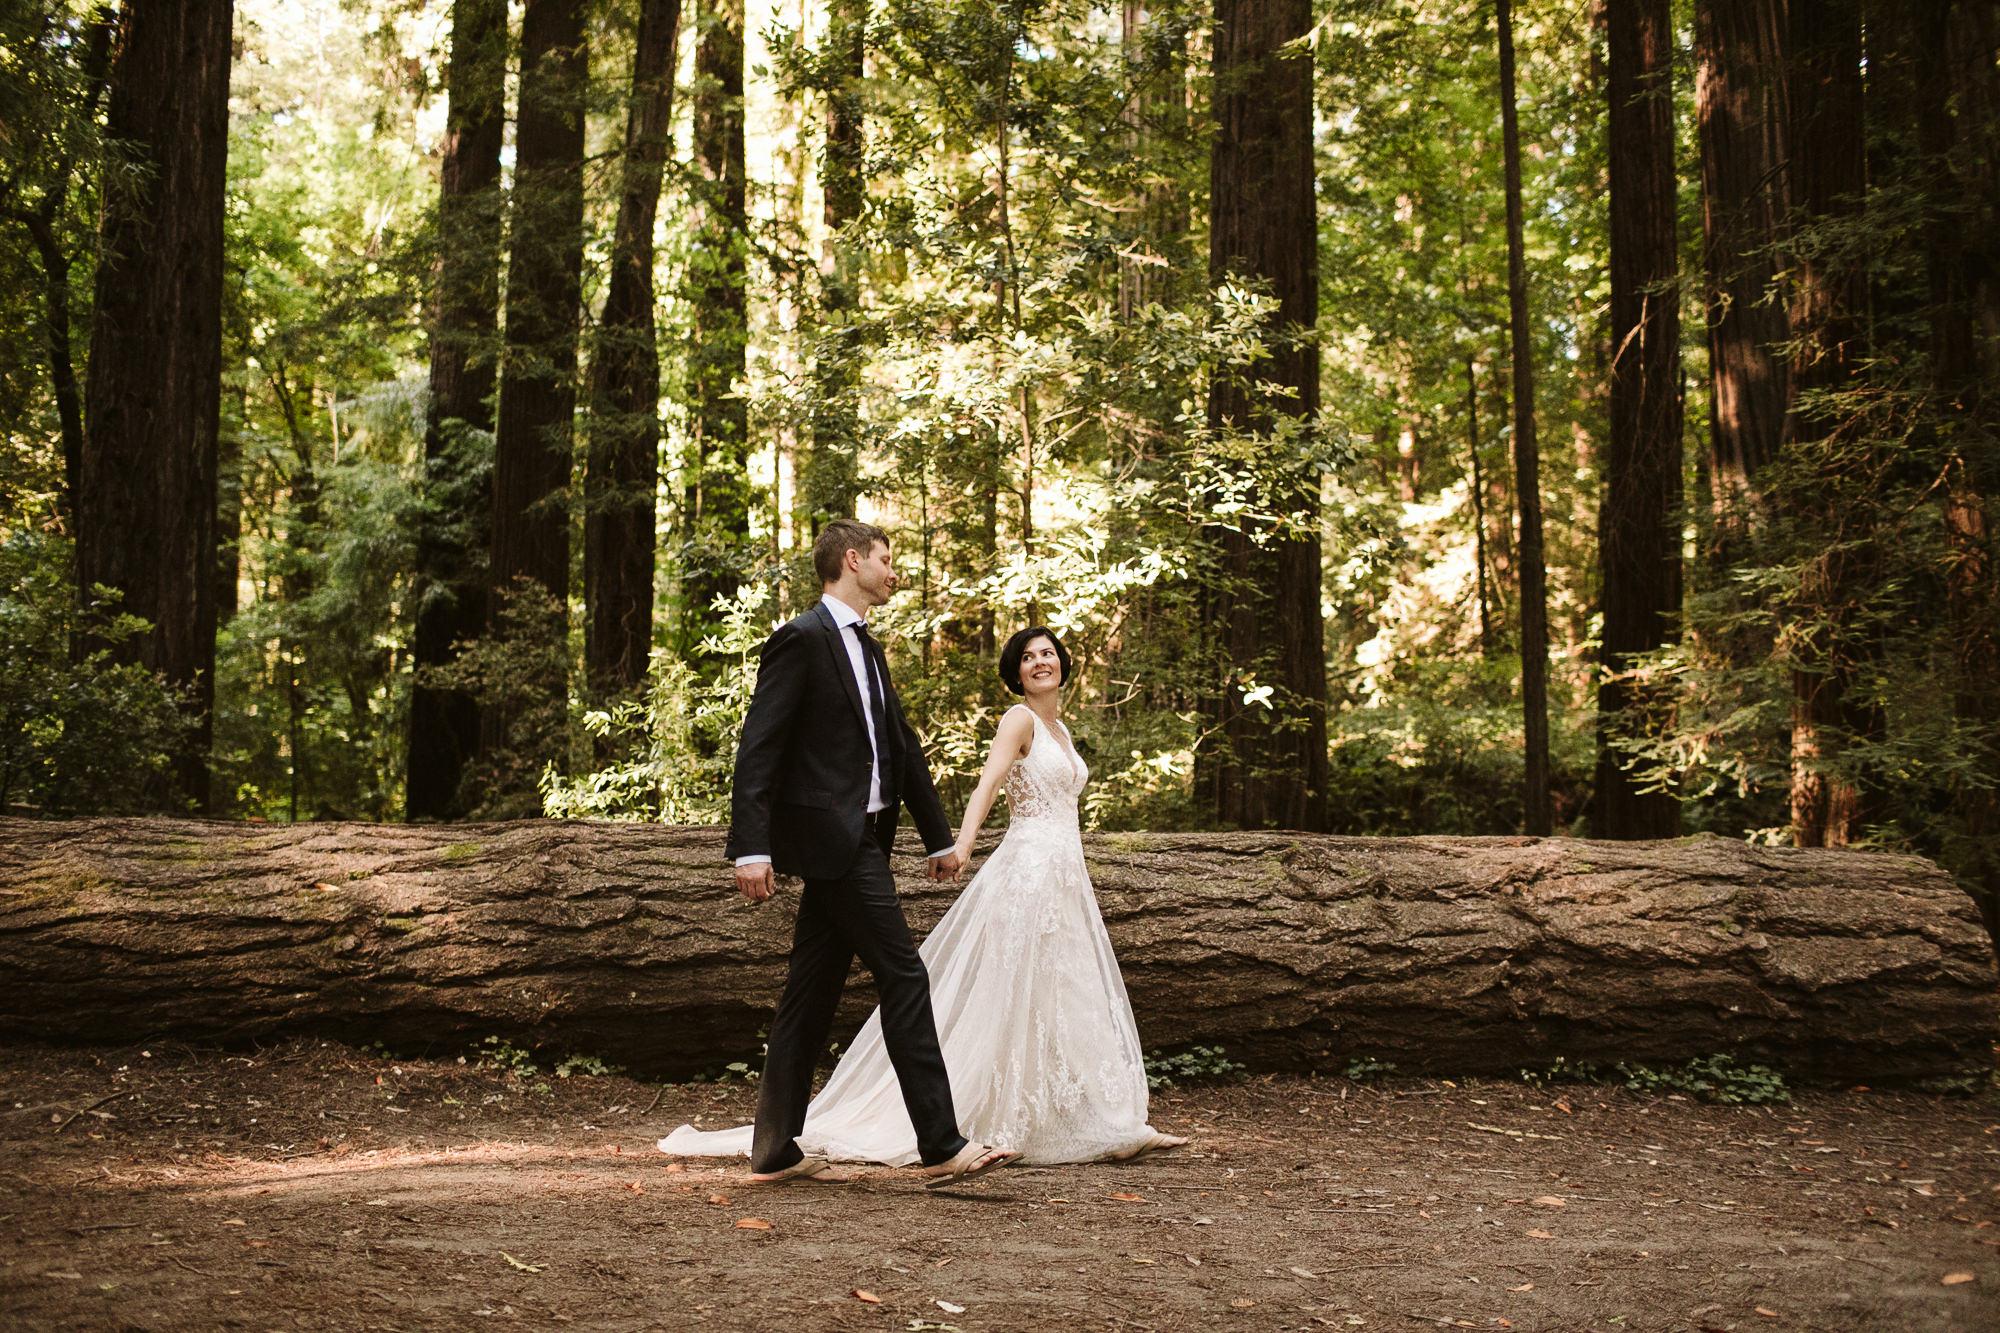 California-wedding-photographer-alfonso-flores-pamplin-groove-291.jpg